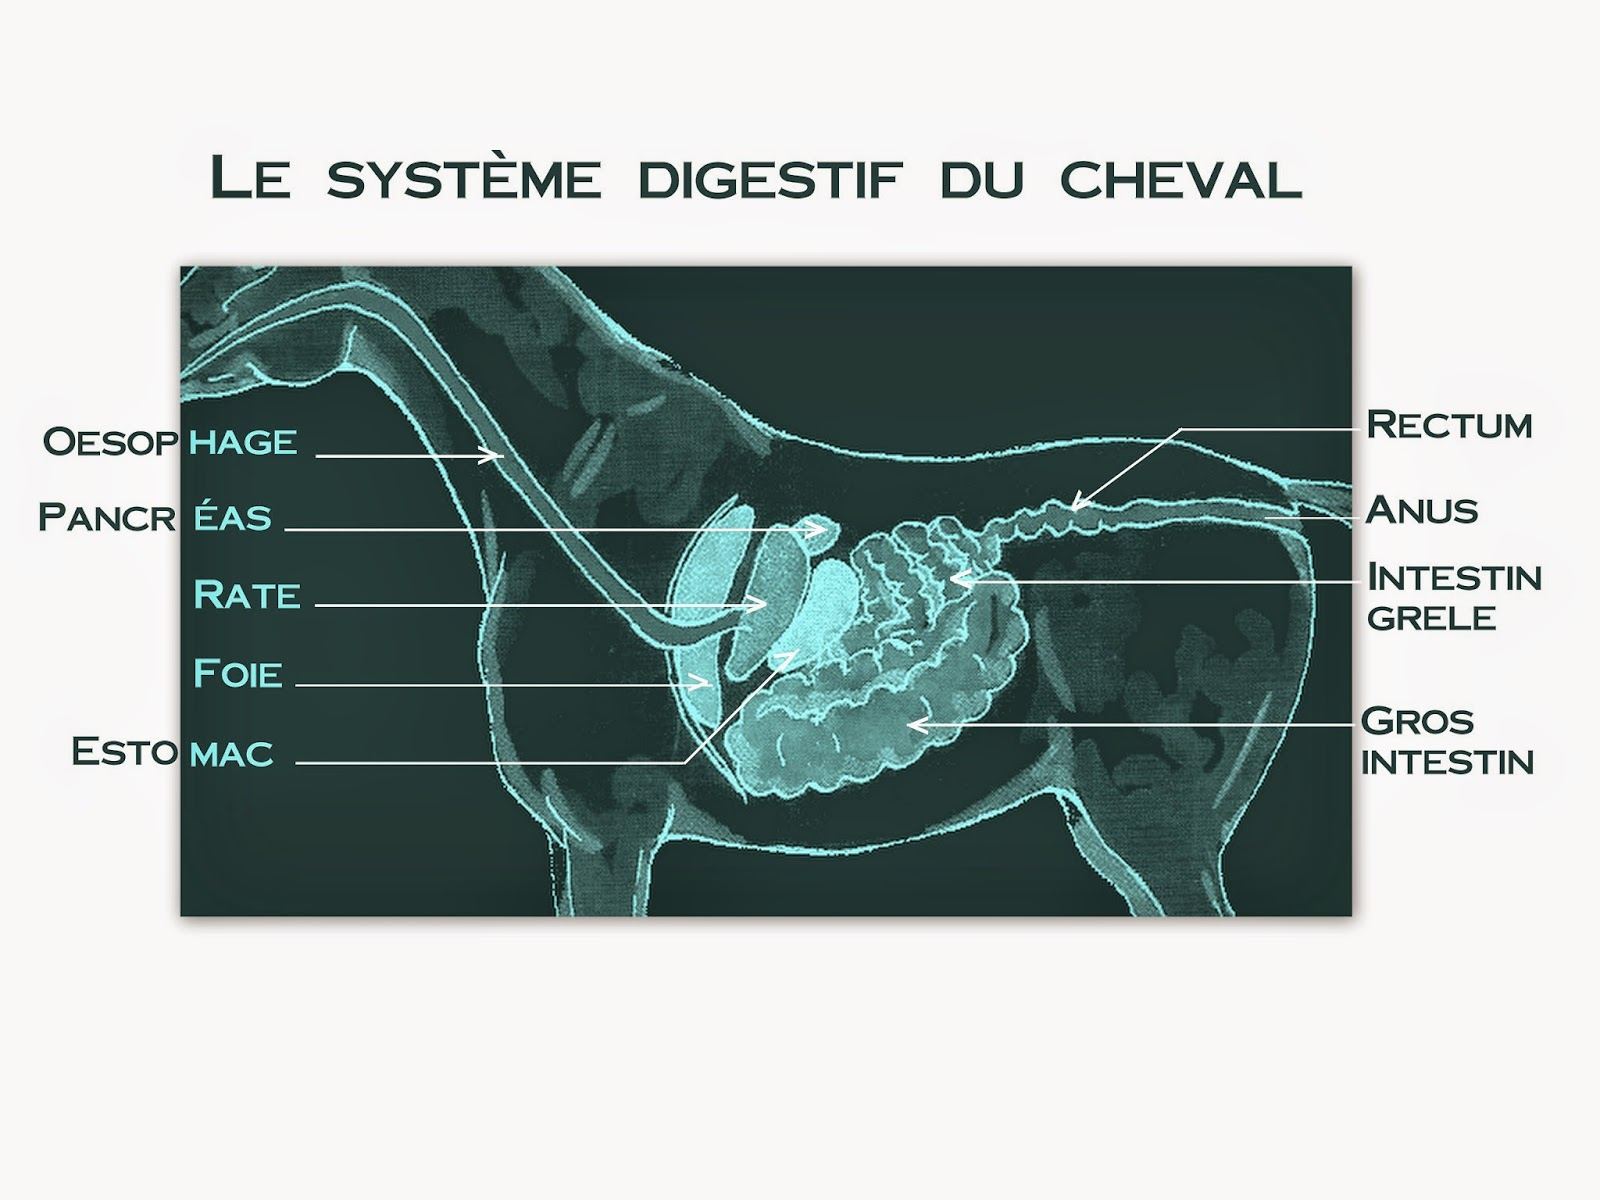 systeme digestif cheval